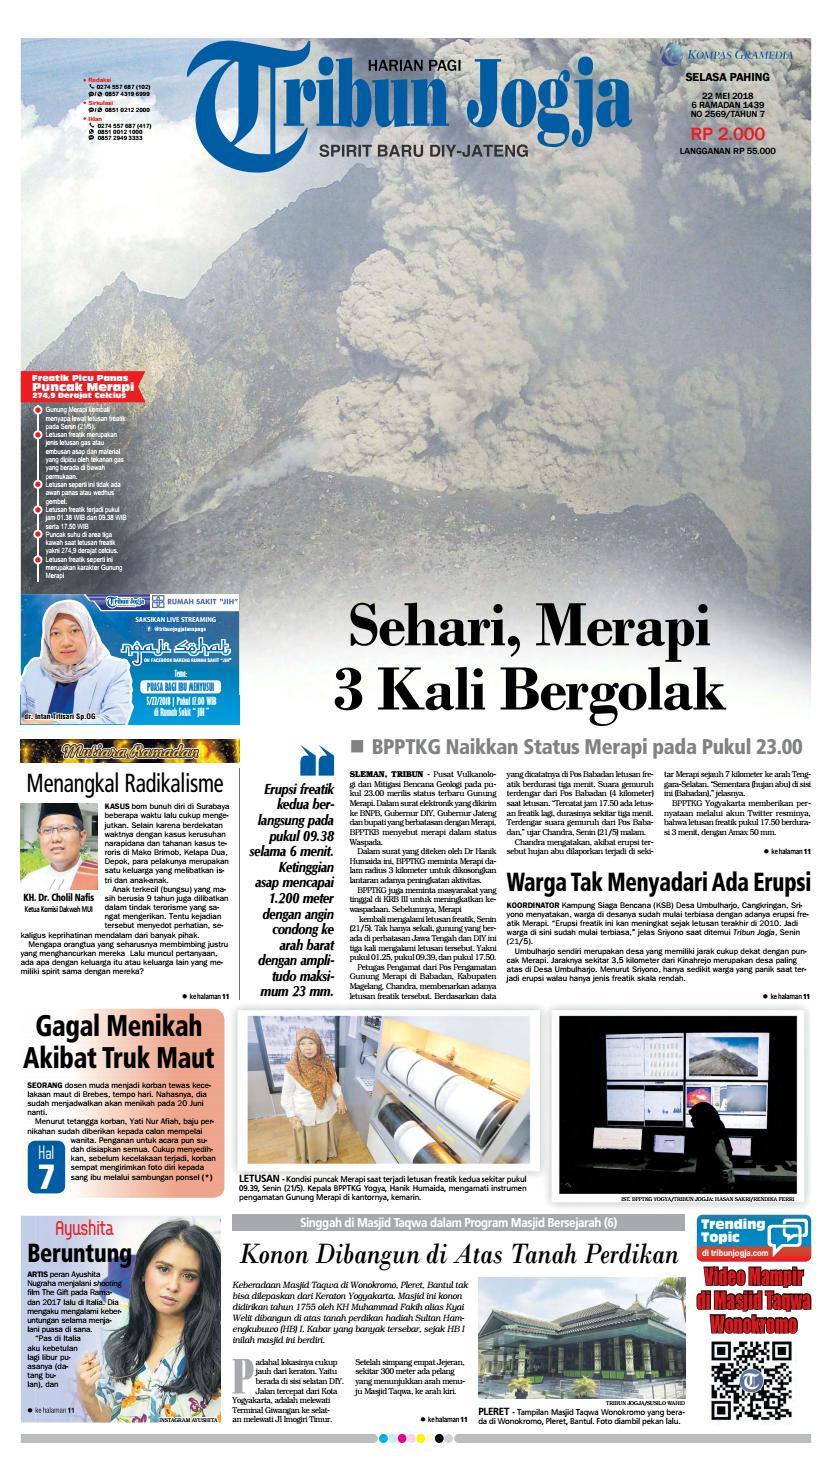 Tribunjogja 22 05 2018 By Tribun Jogja Issuu Produk Ukm Bumn Kain Batik Middle Premium 3 Bendera 01